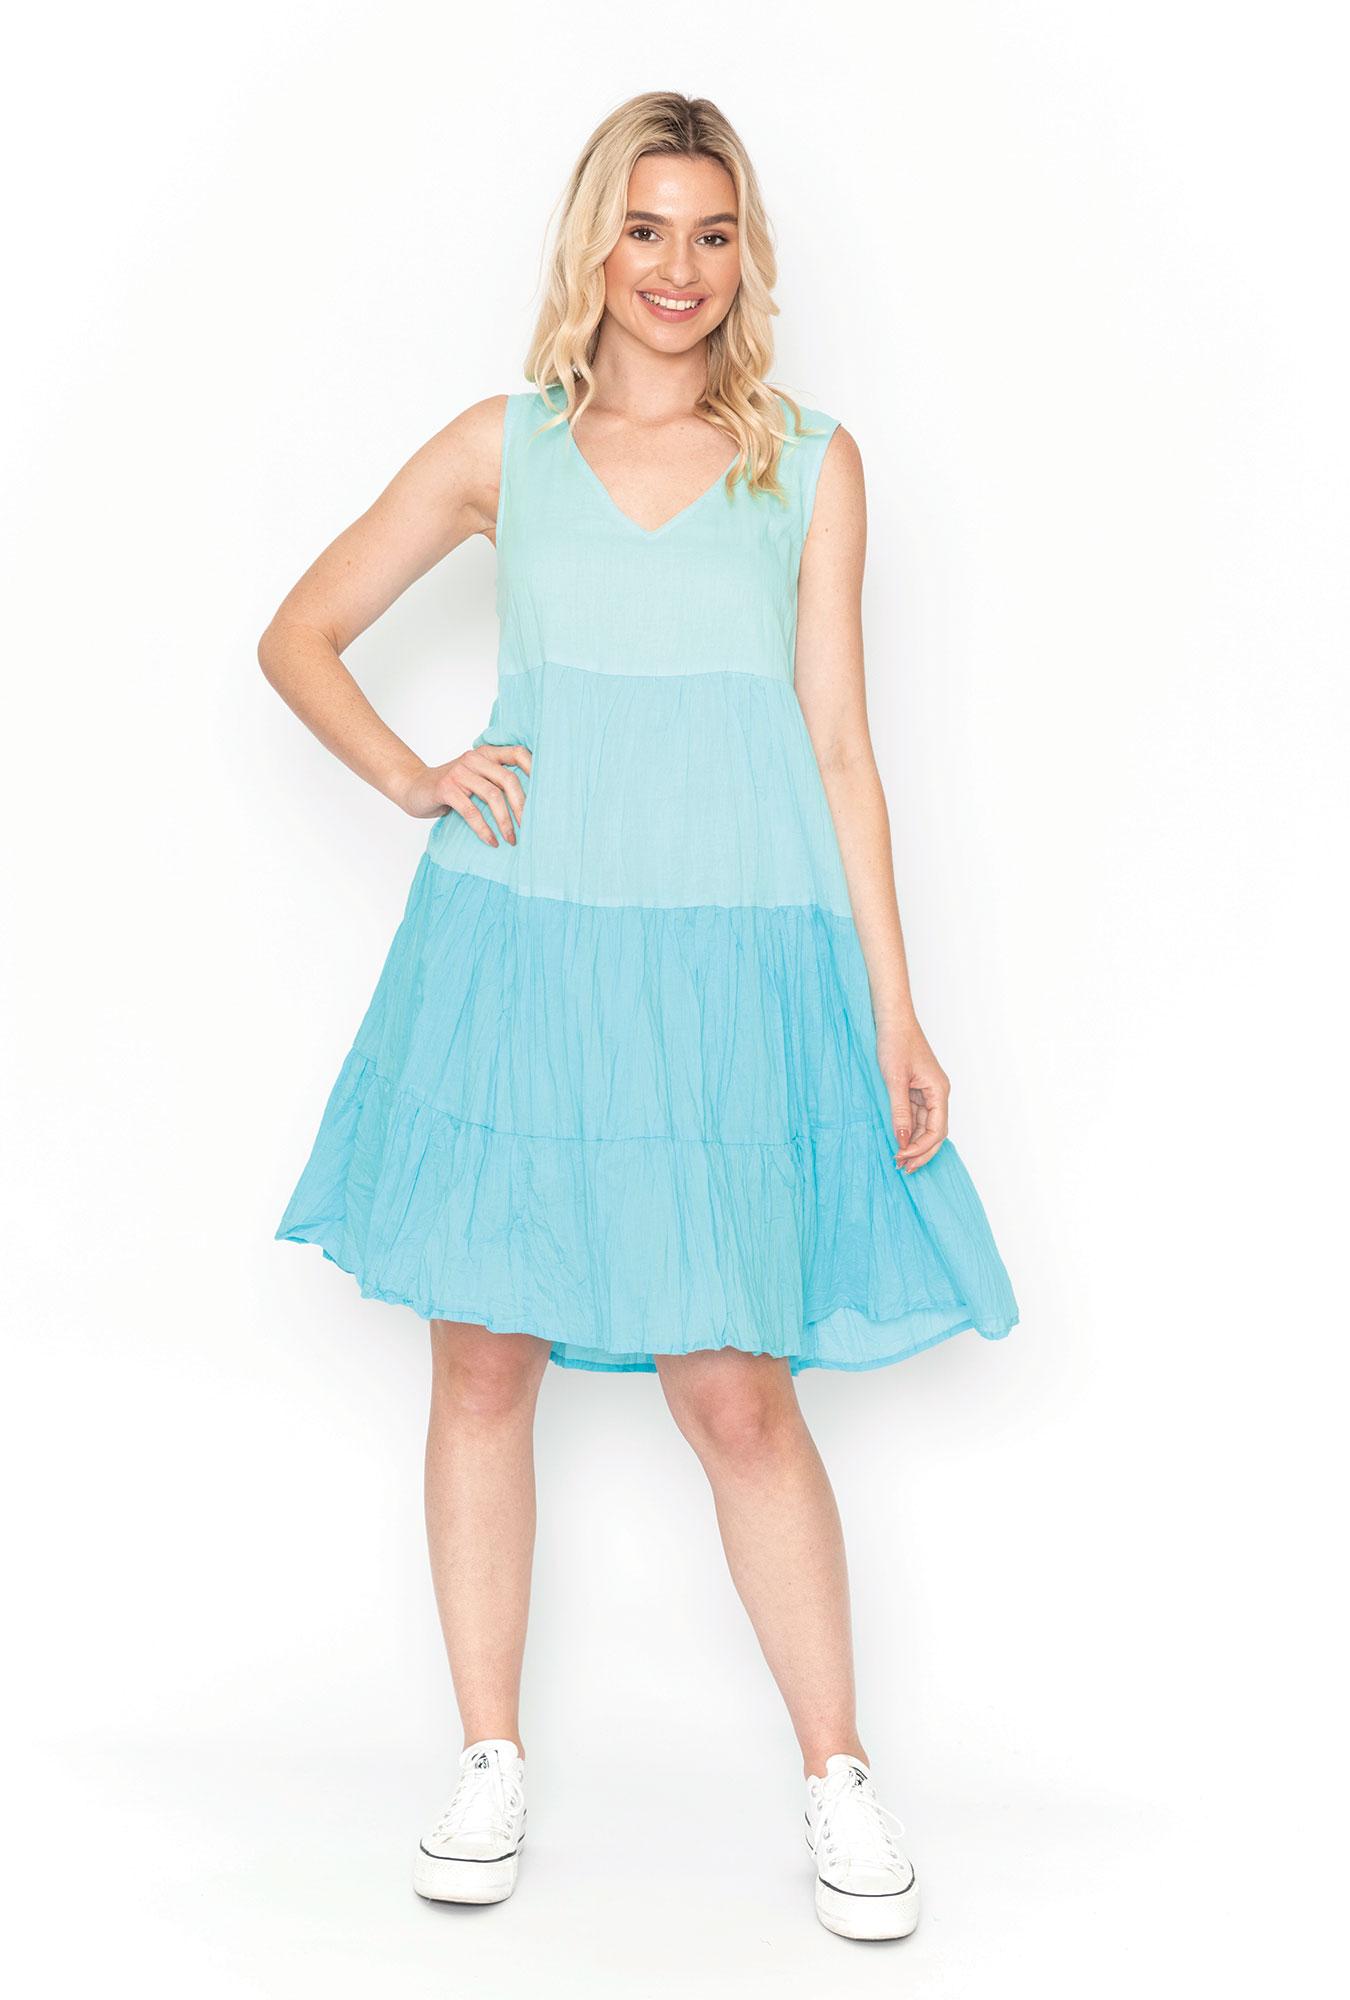 Stella Ombre Dress in Aqua